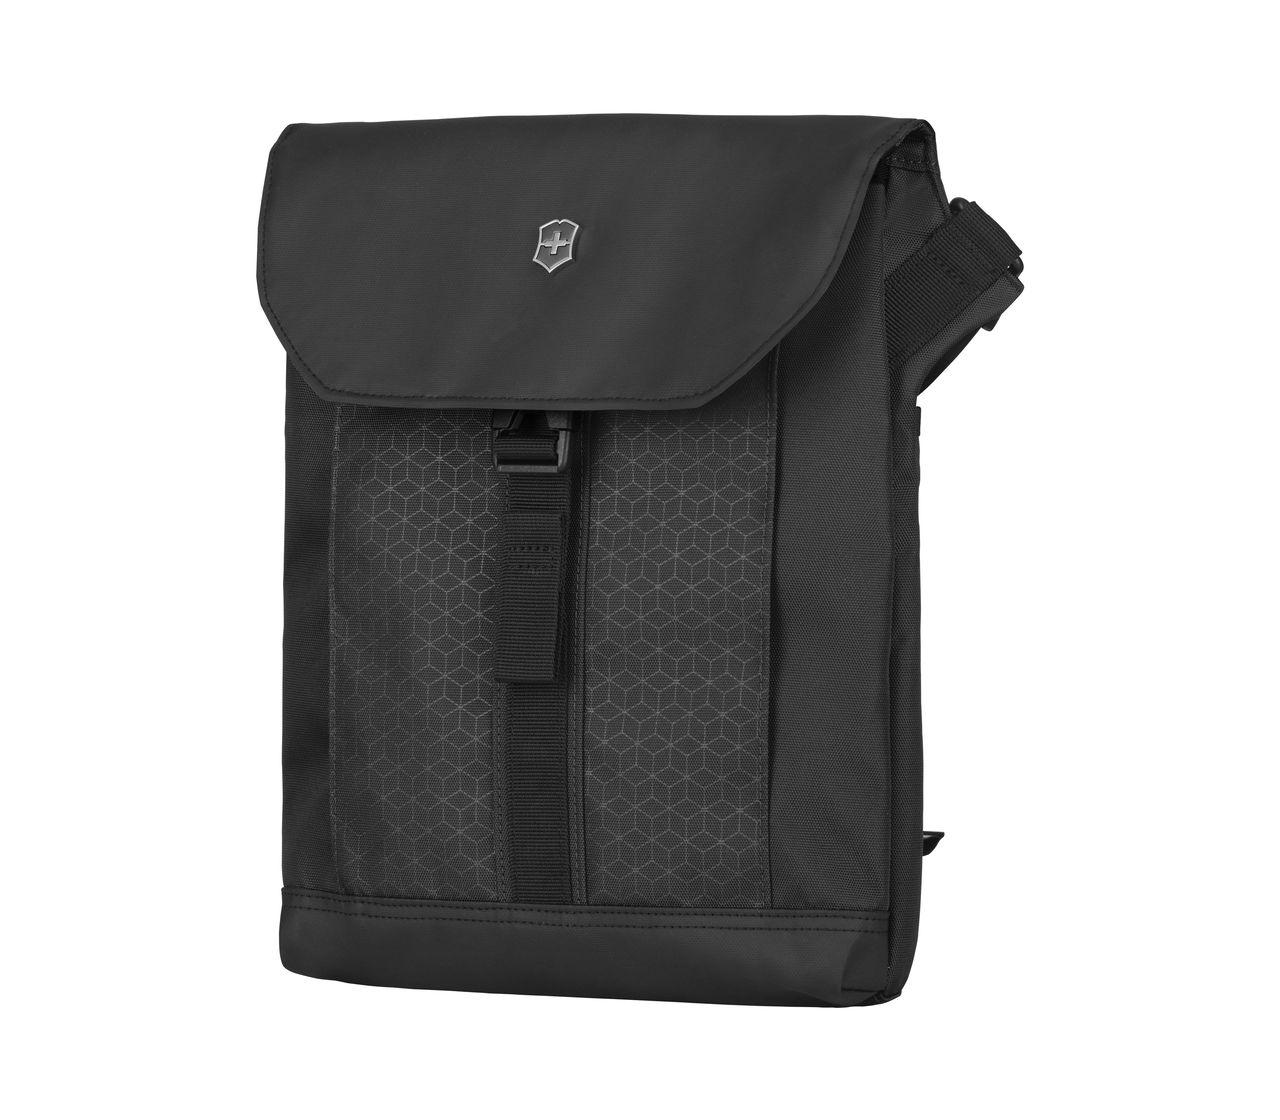 Victorinox Altmont Original Flapover Digital Bag In Black